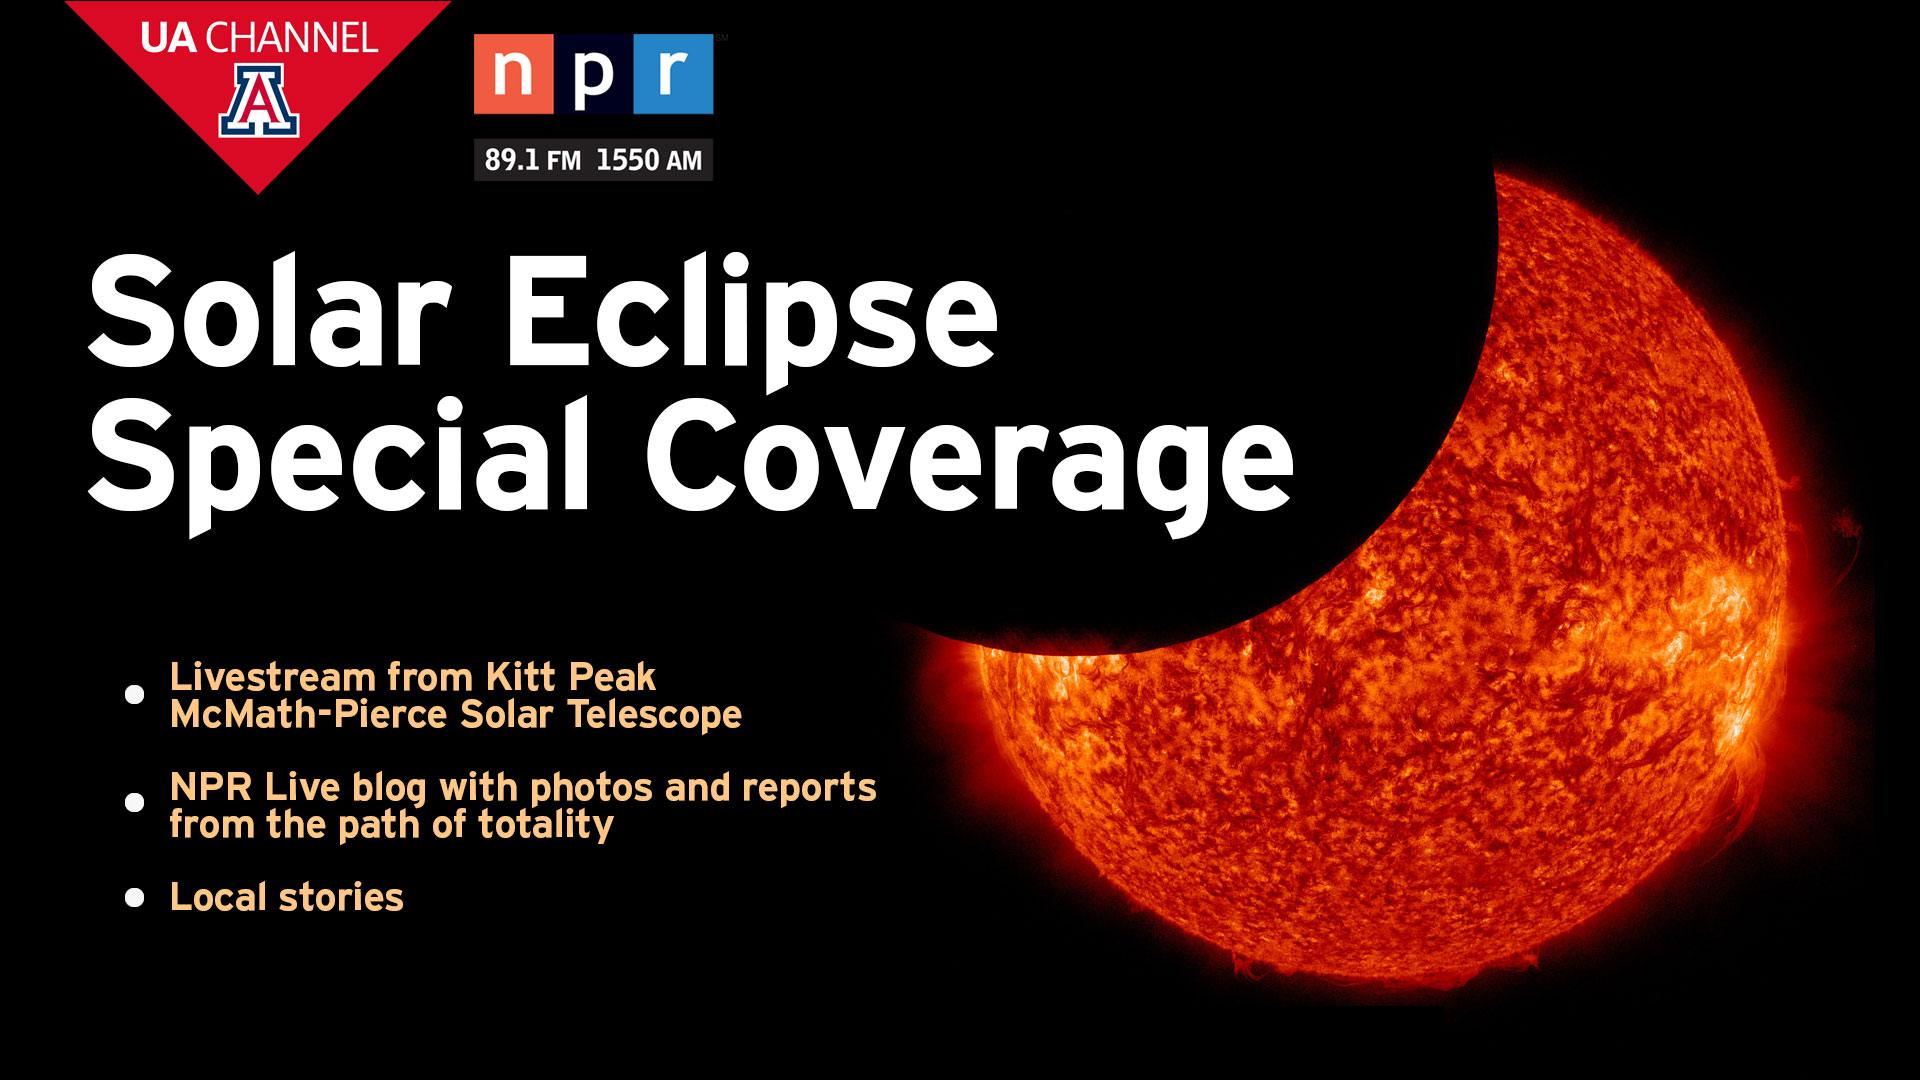 Tucson Solar Eclipse 2017 Coverage | UA Channel